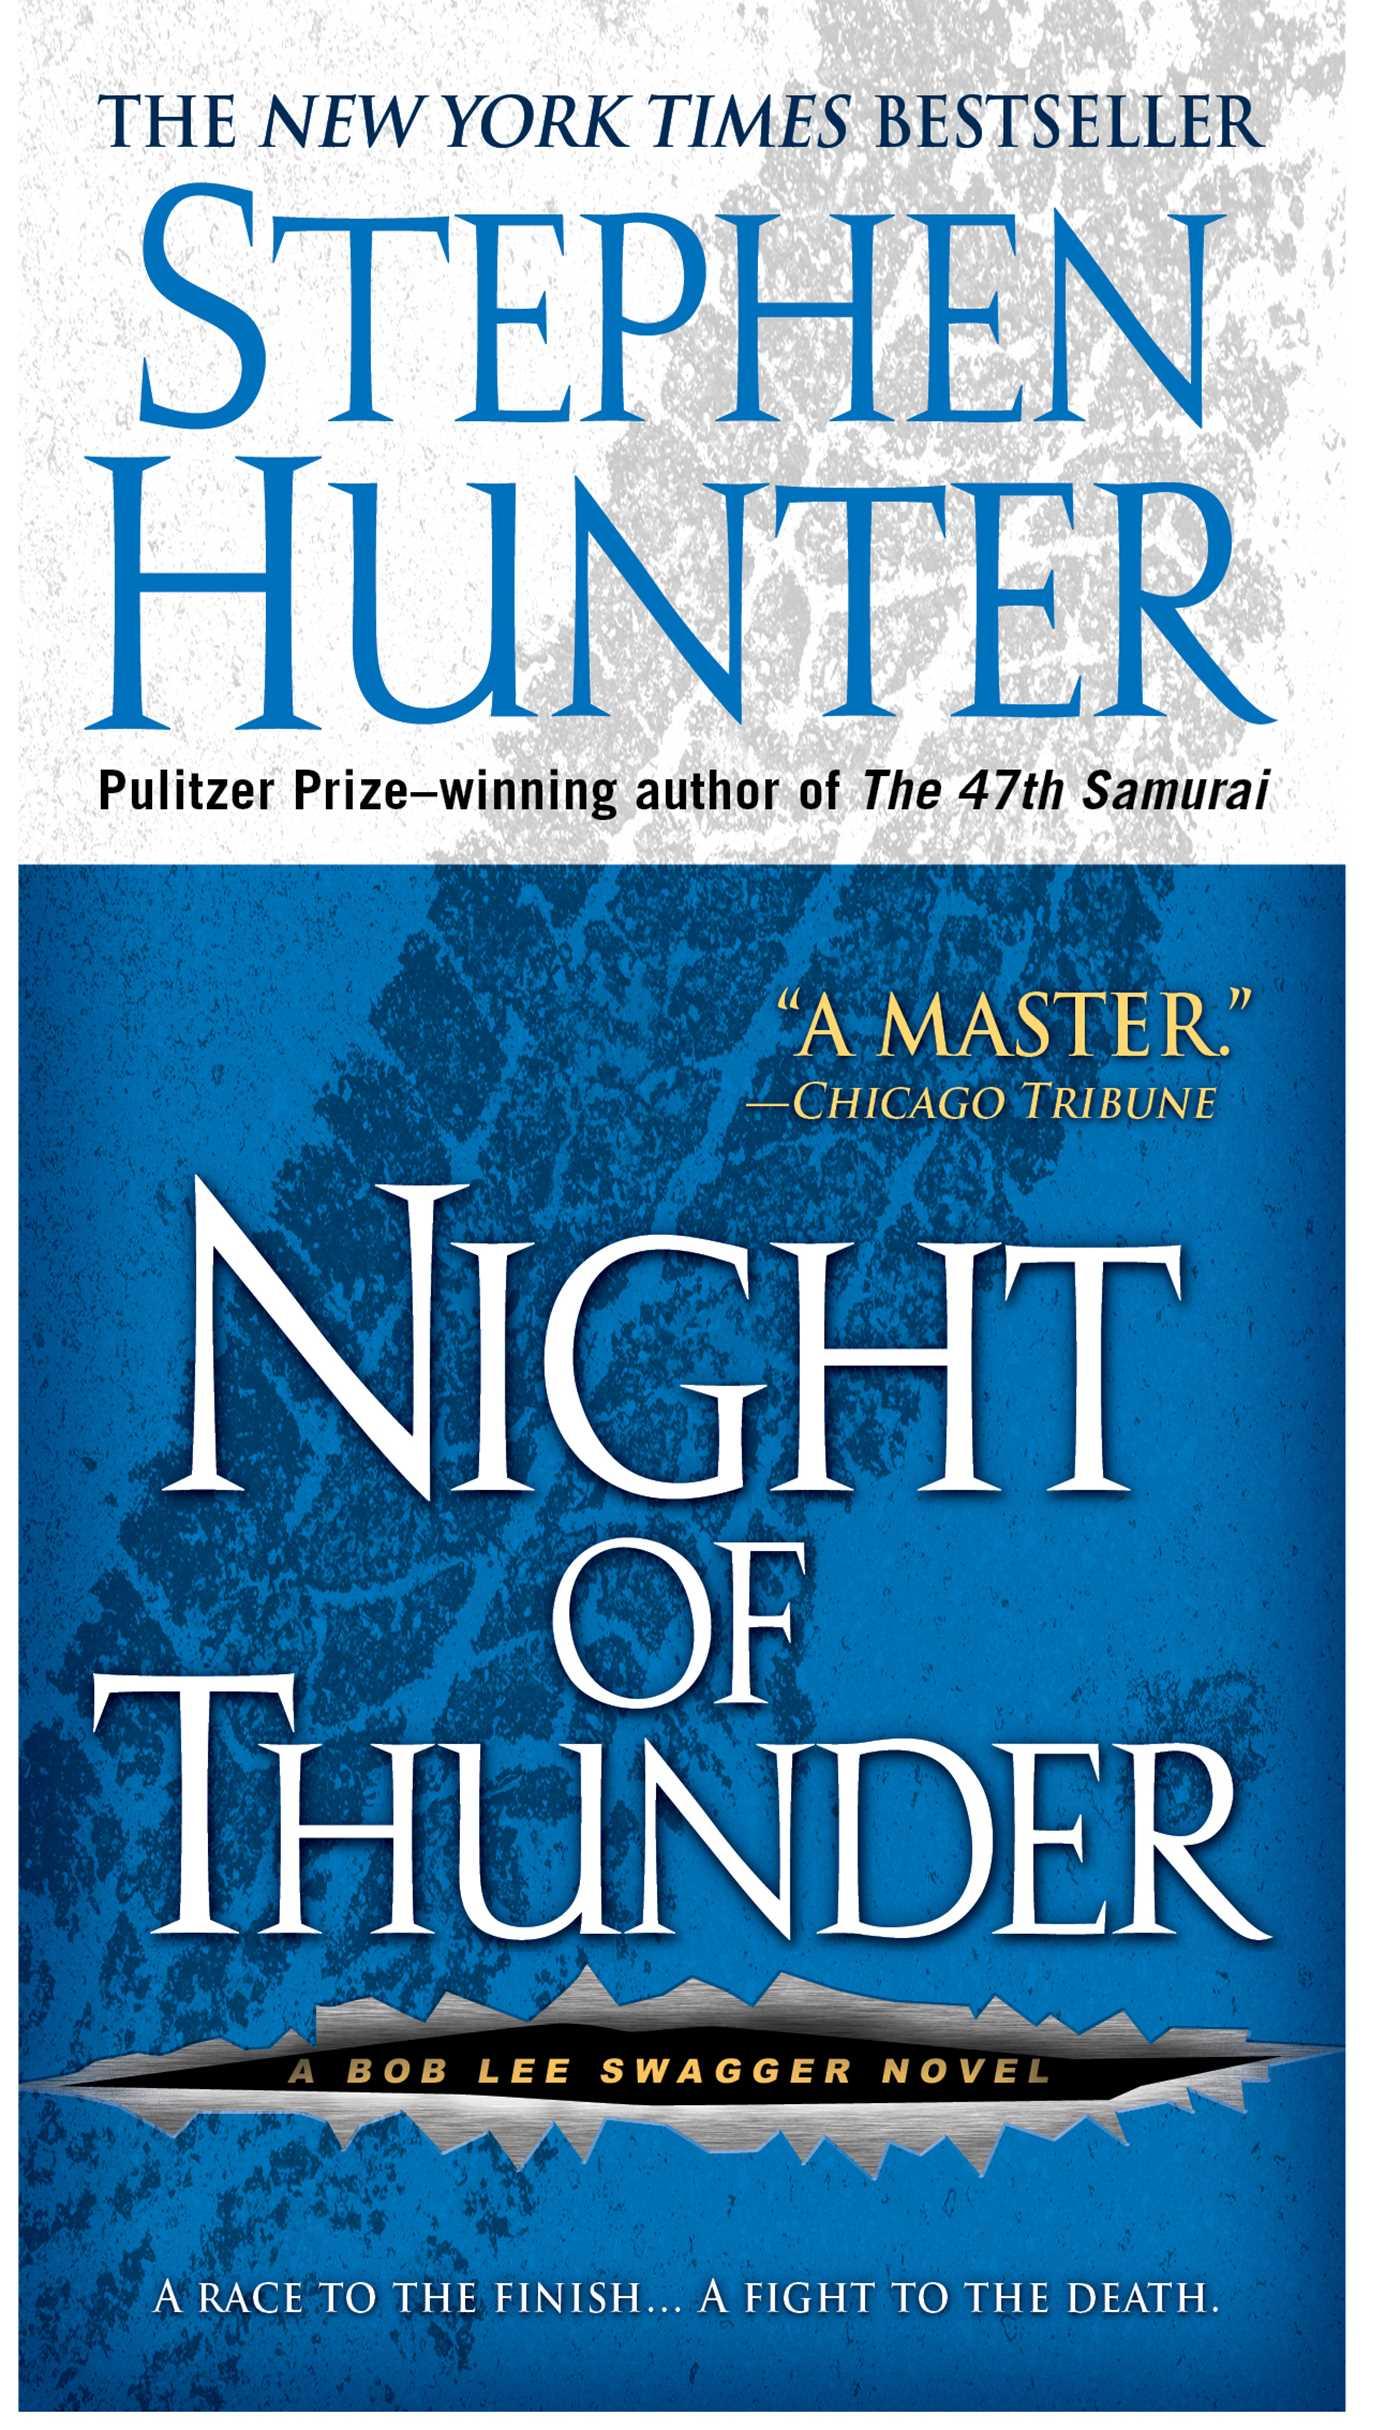 Book Cover Image (jpg): Night of Thunder